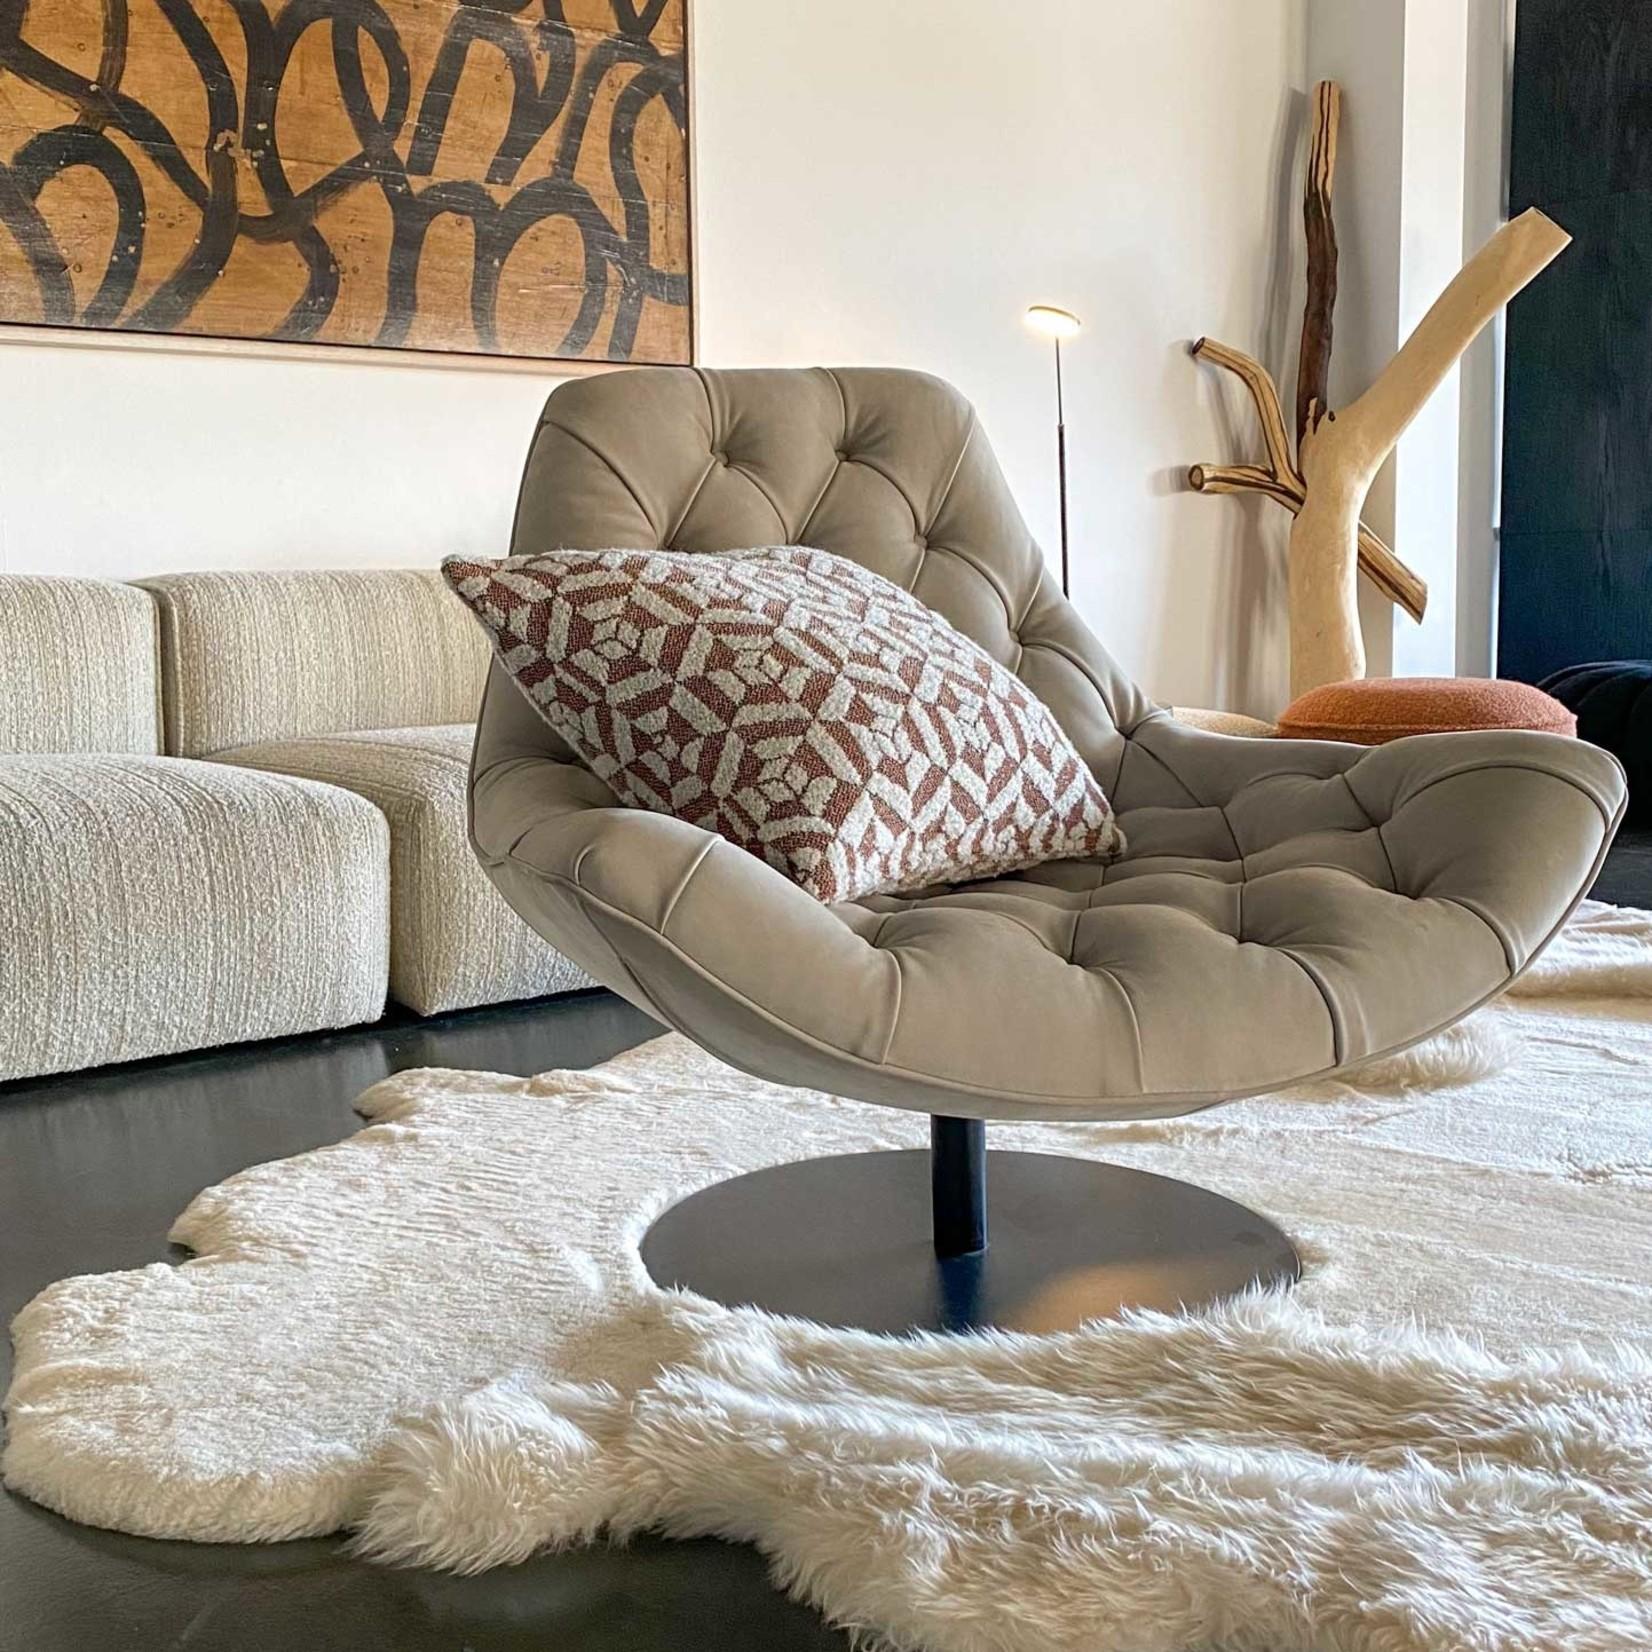 Evolution 21 Nabuk Leather Natural | Swivel Chair